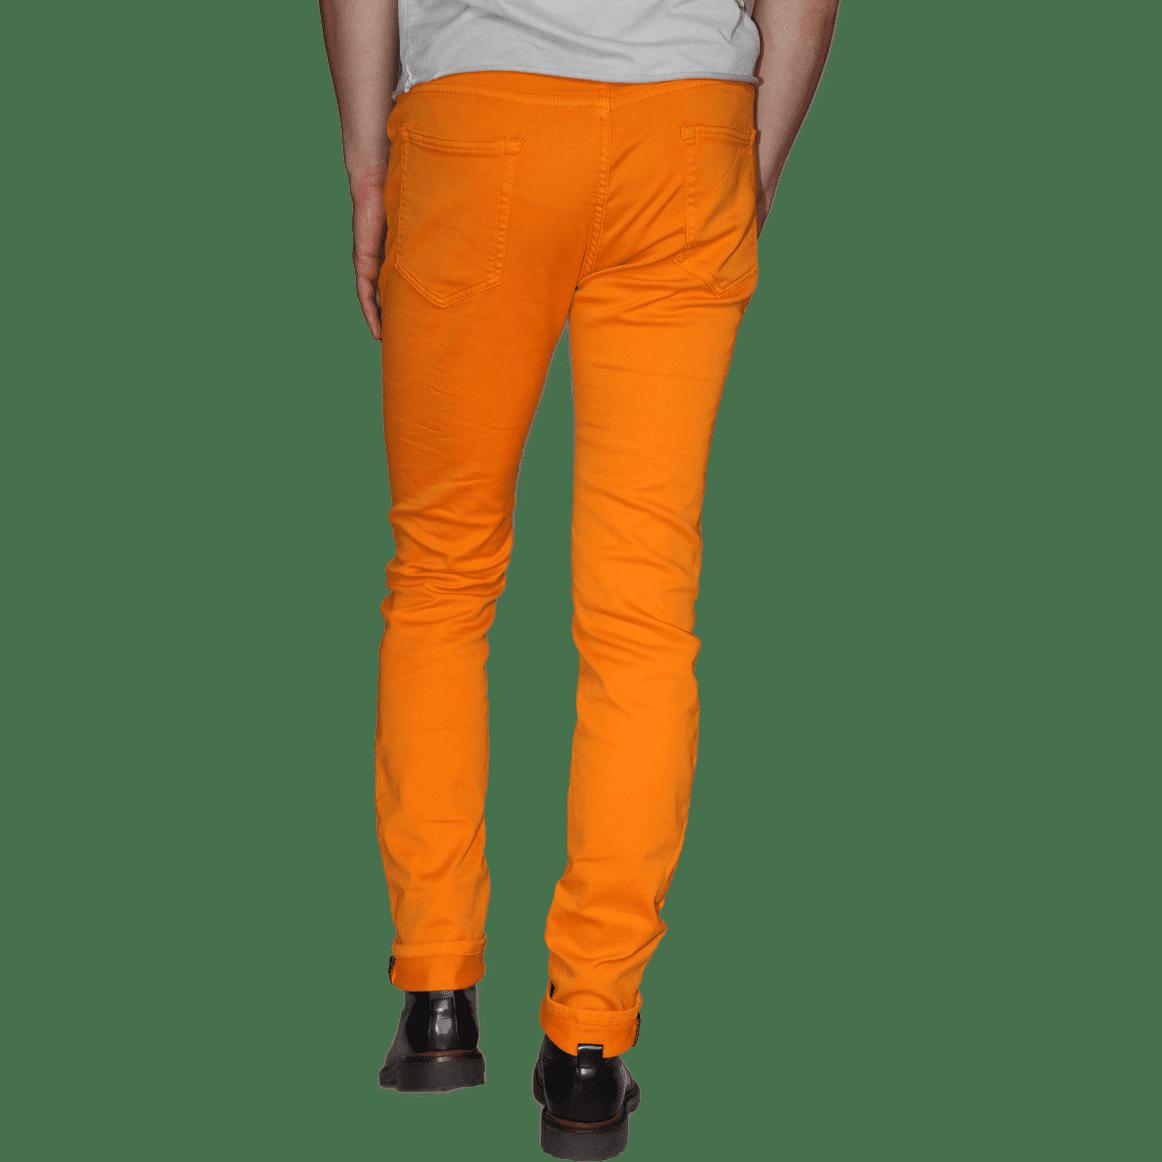 Cabinero Stiles Berlin PG Enjoy Jeans, Herrenhosen, made in Italy AW17-18 denim curry blue 4